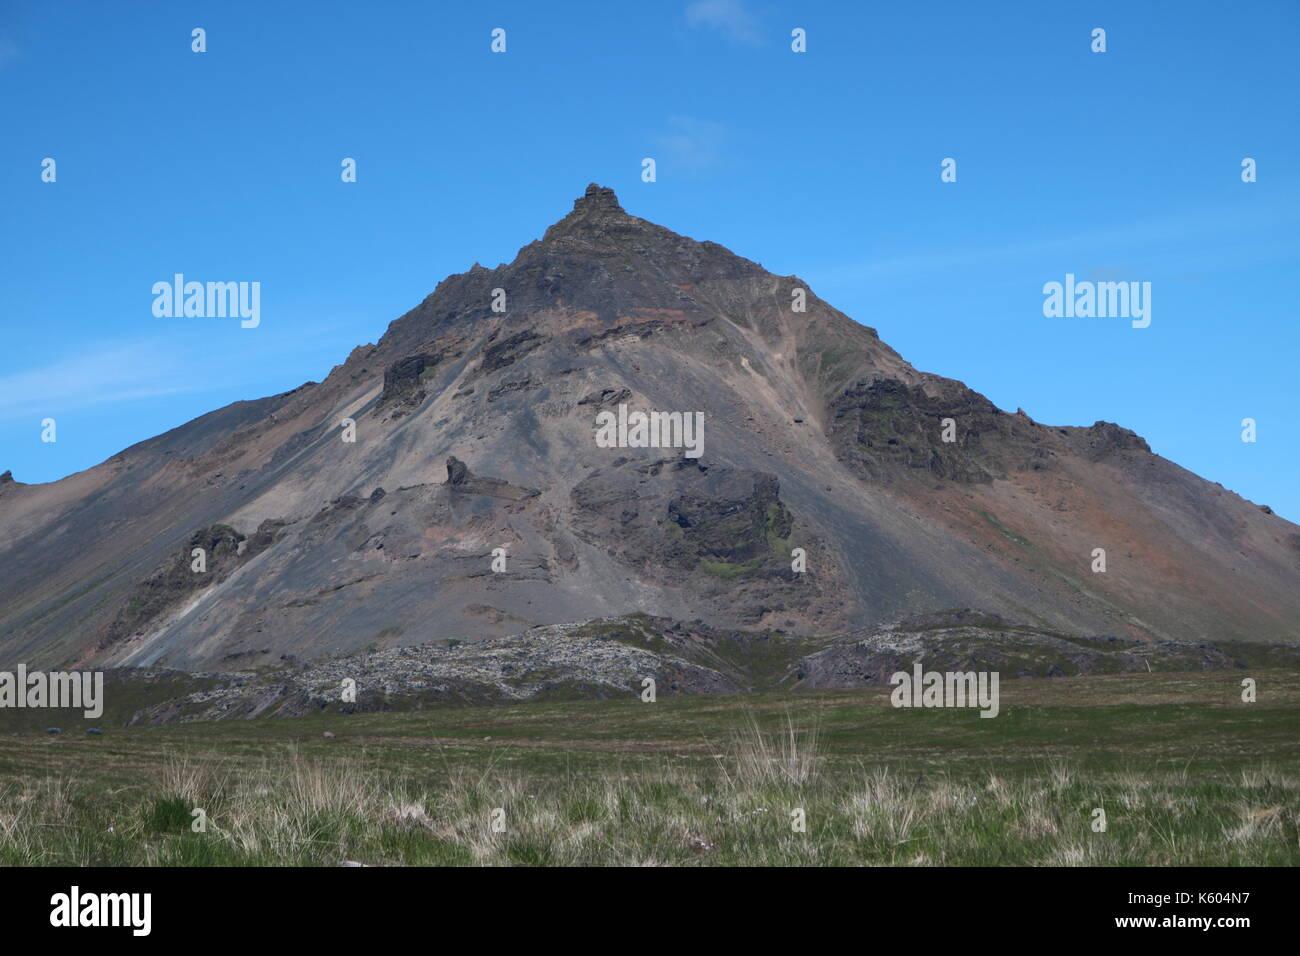 Iceland Mountain - Stock Image